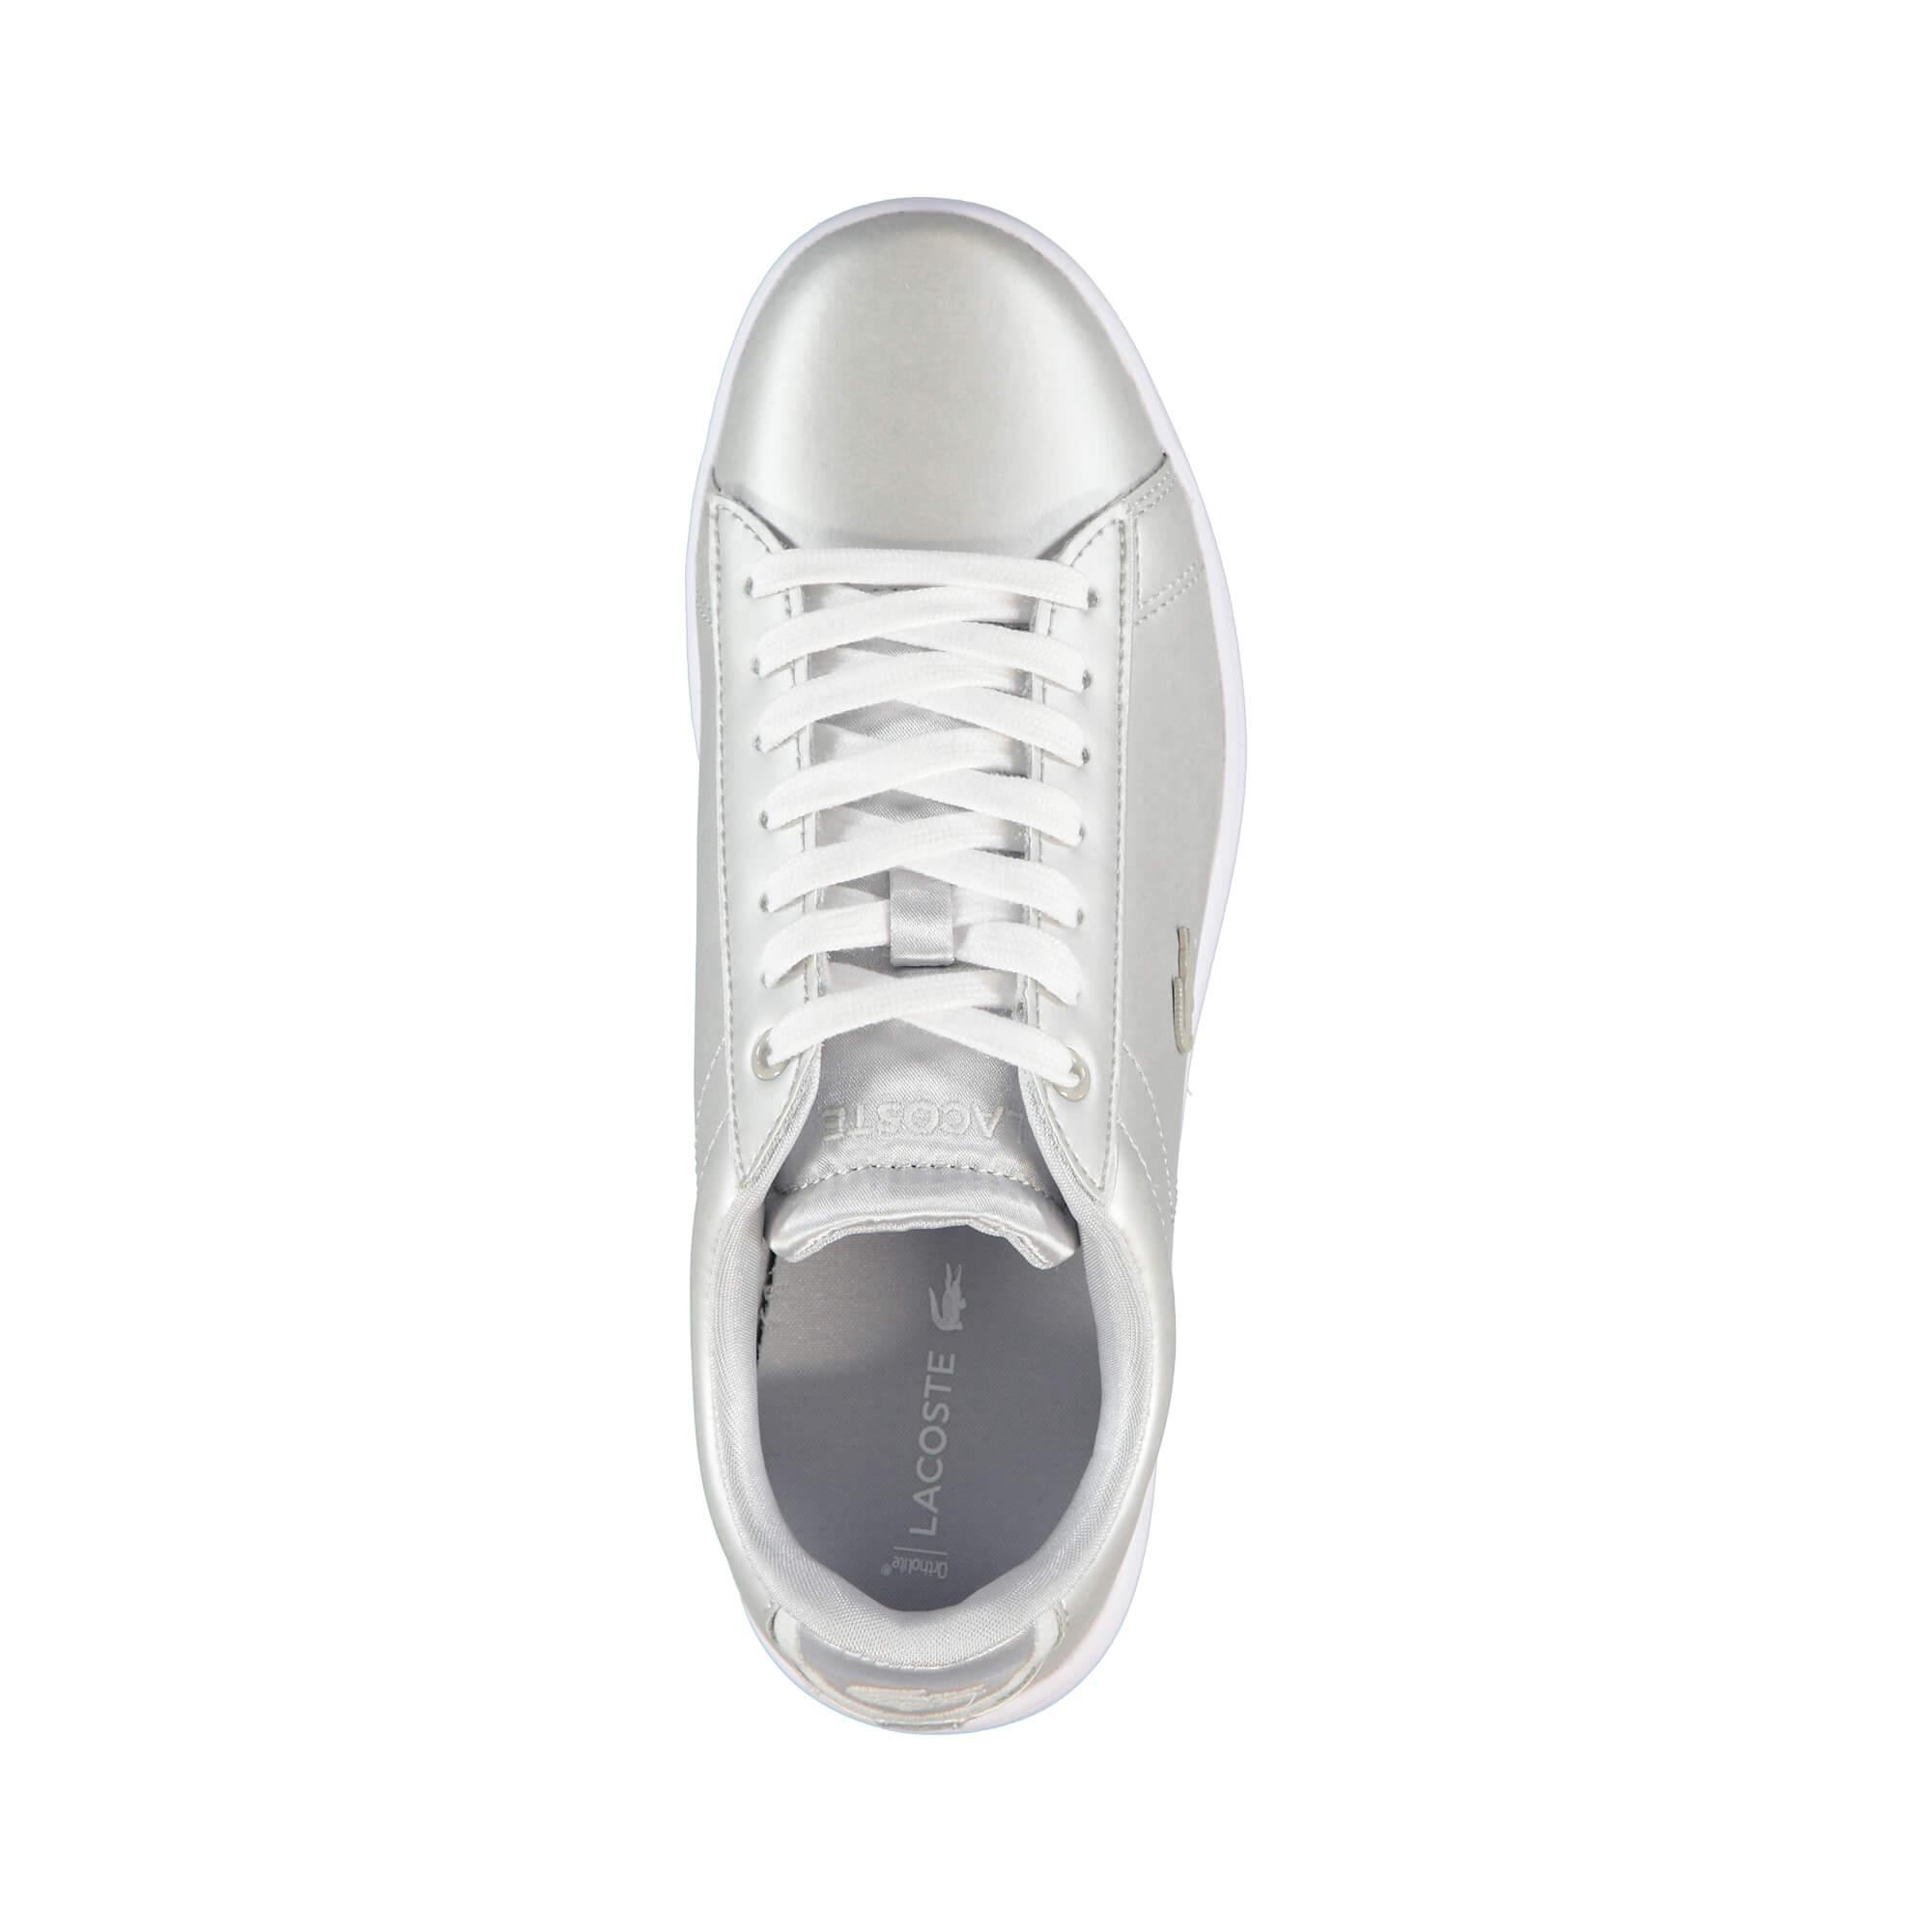 Lacoste Carnaby Evo Gri Kadın Sneaker